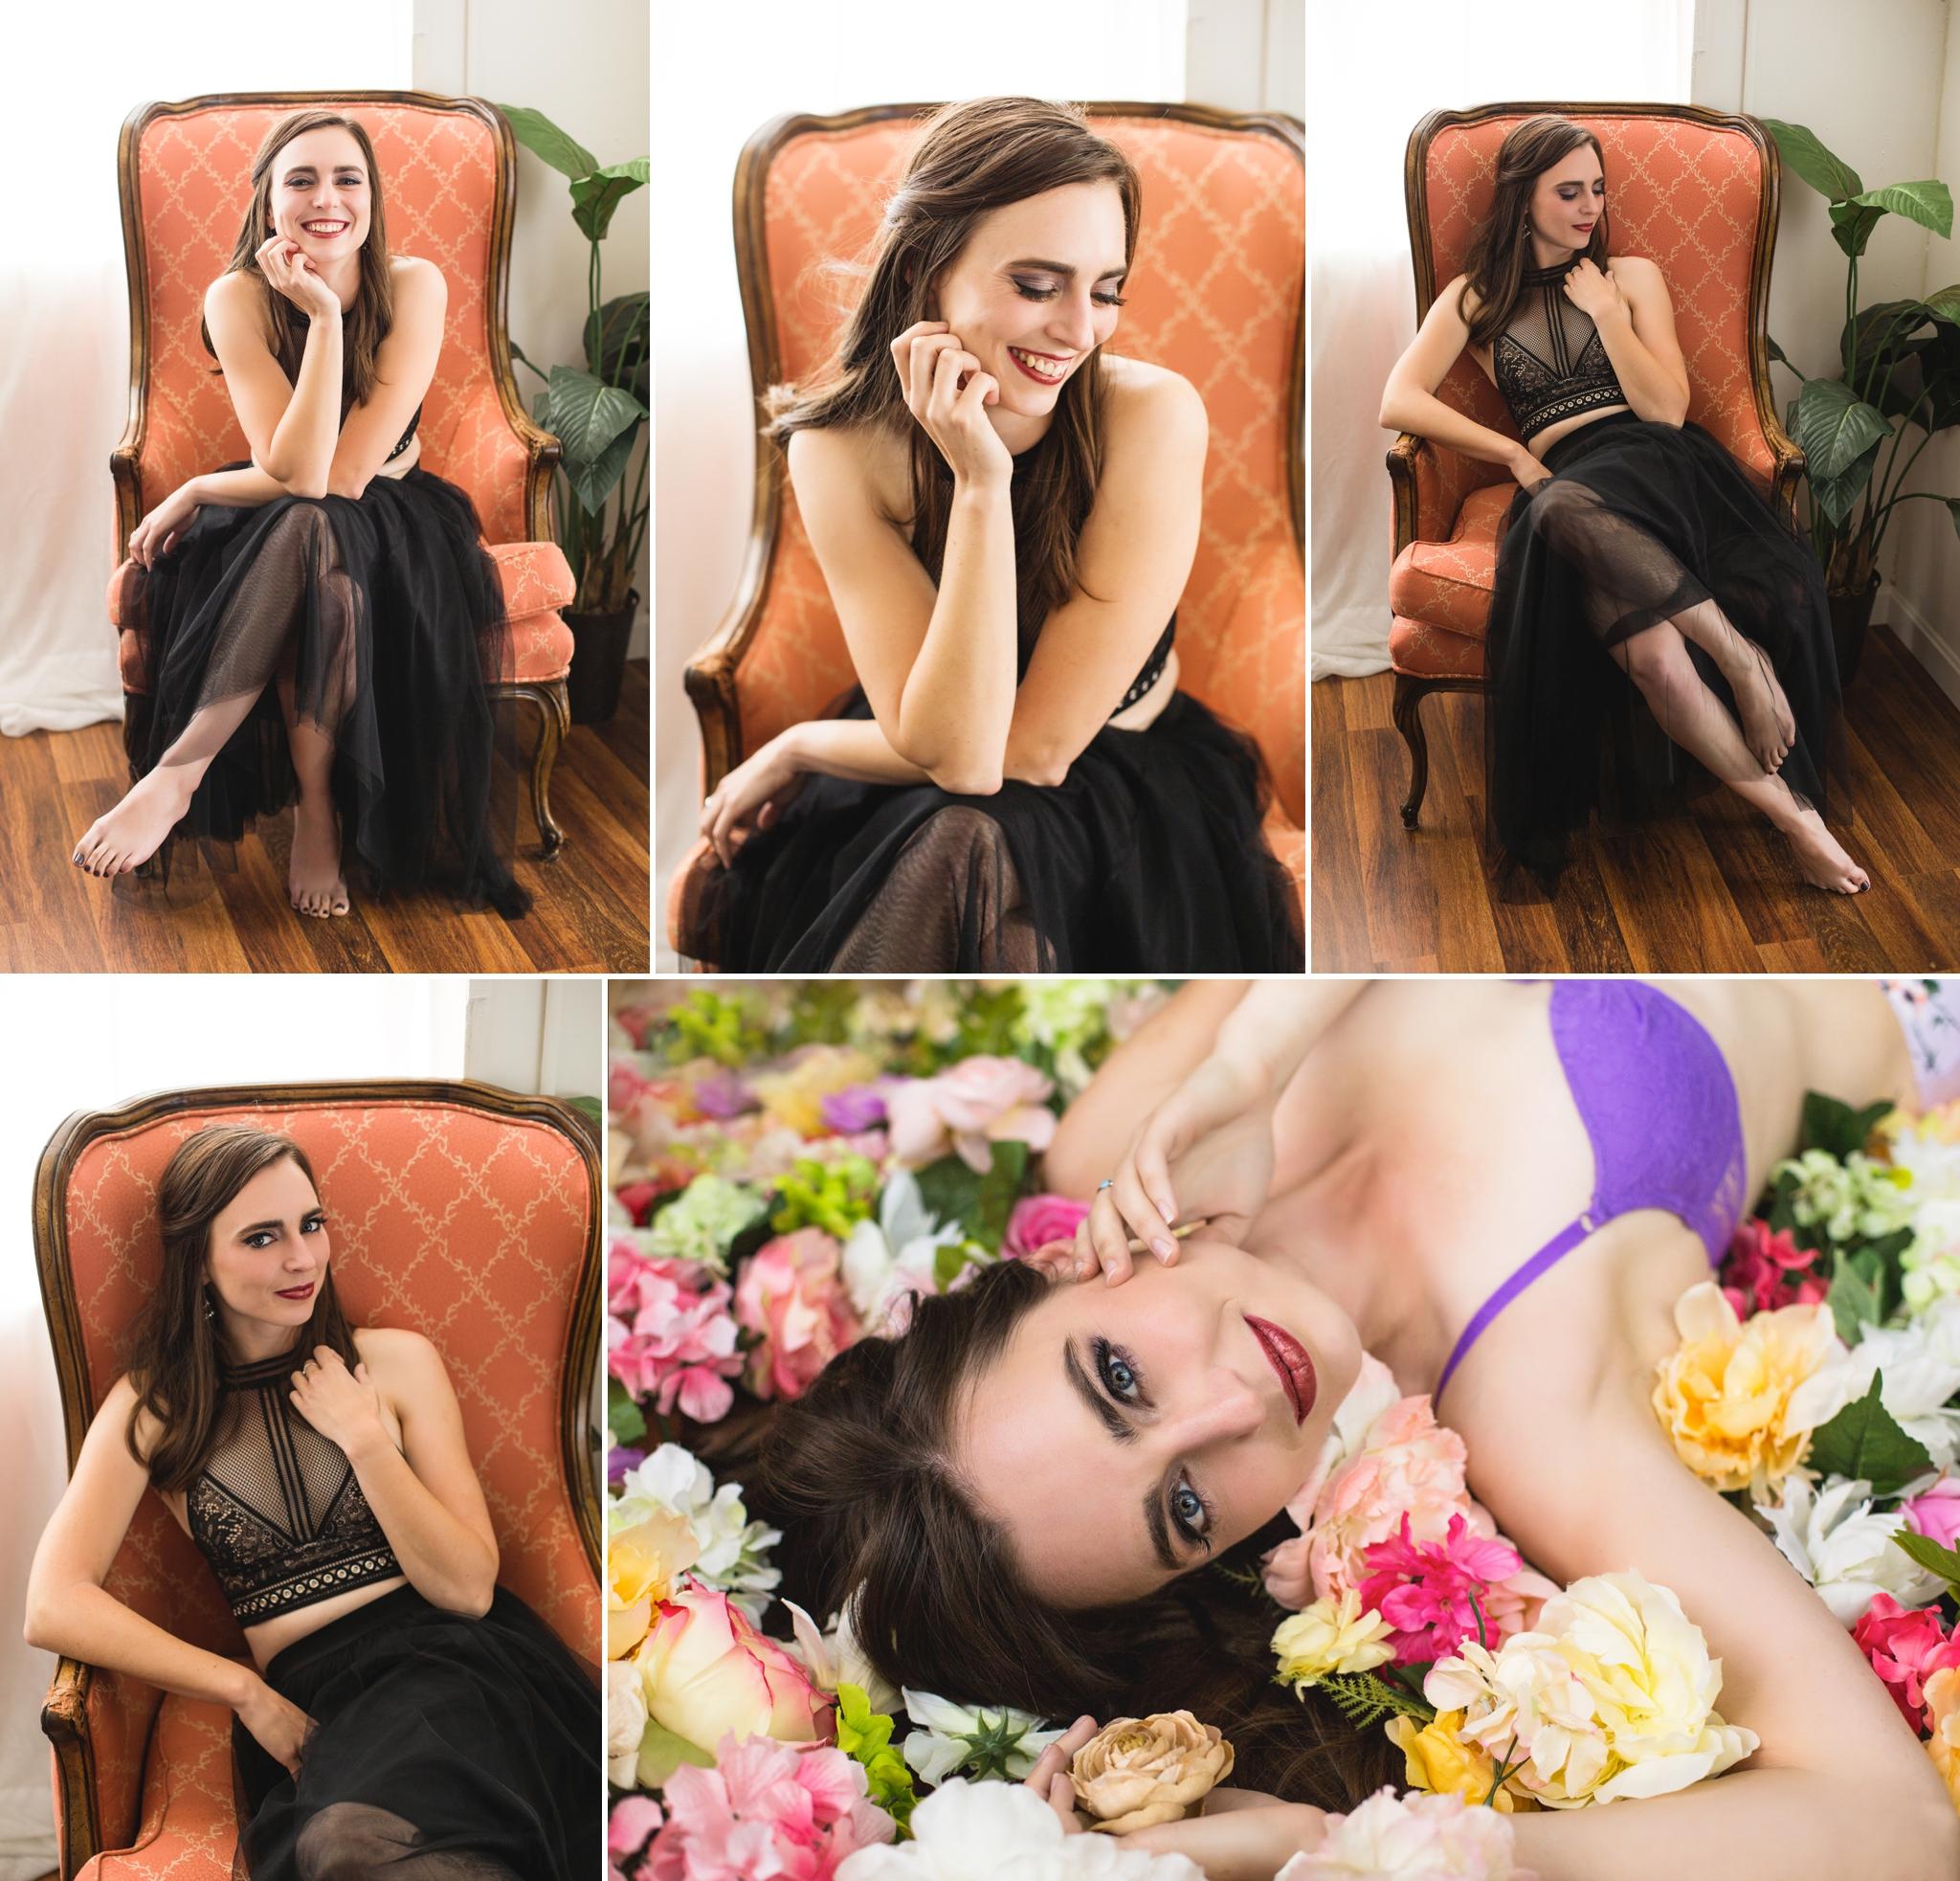 Amanda Gland Collage 9.jpg